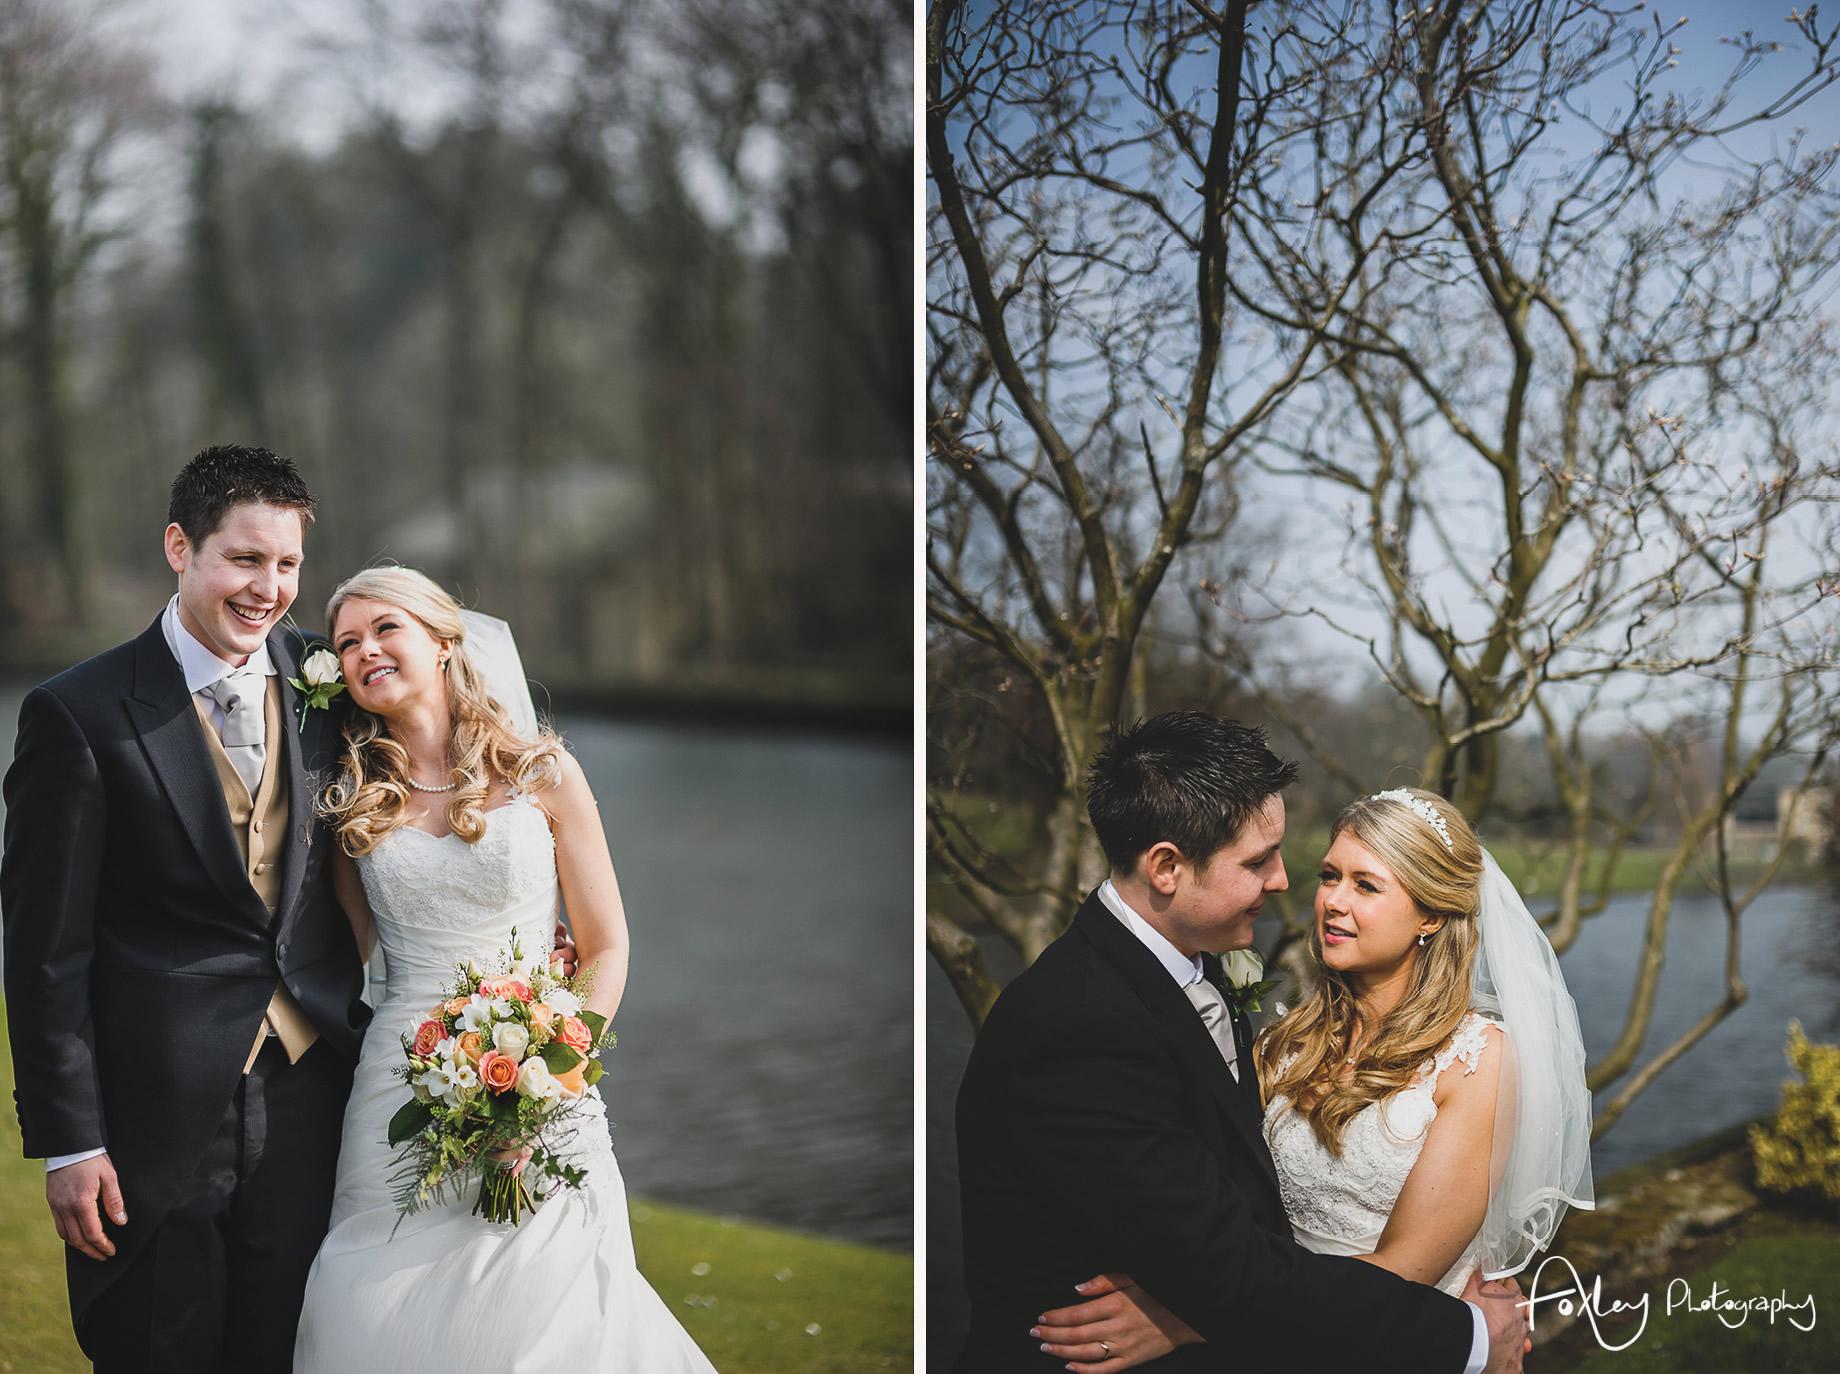 Gemma and Lewis' Wedding at Mitton Hall 089